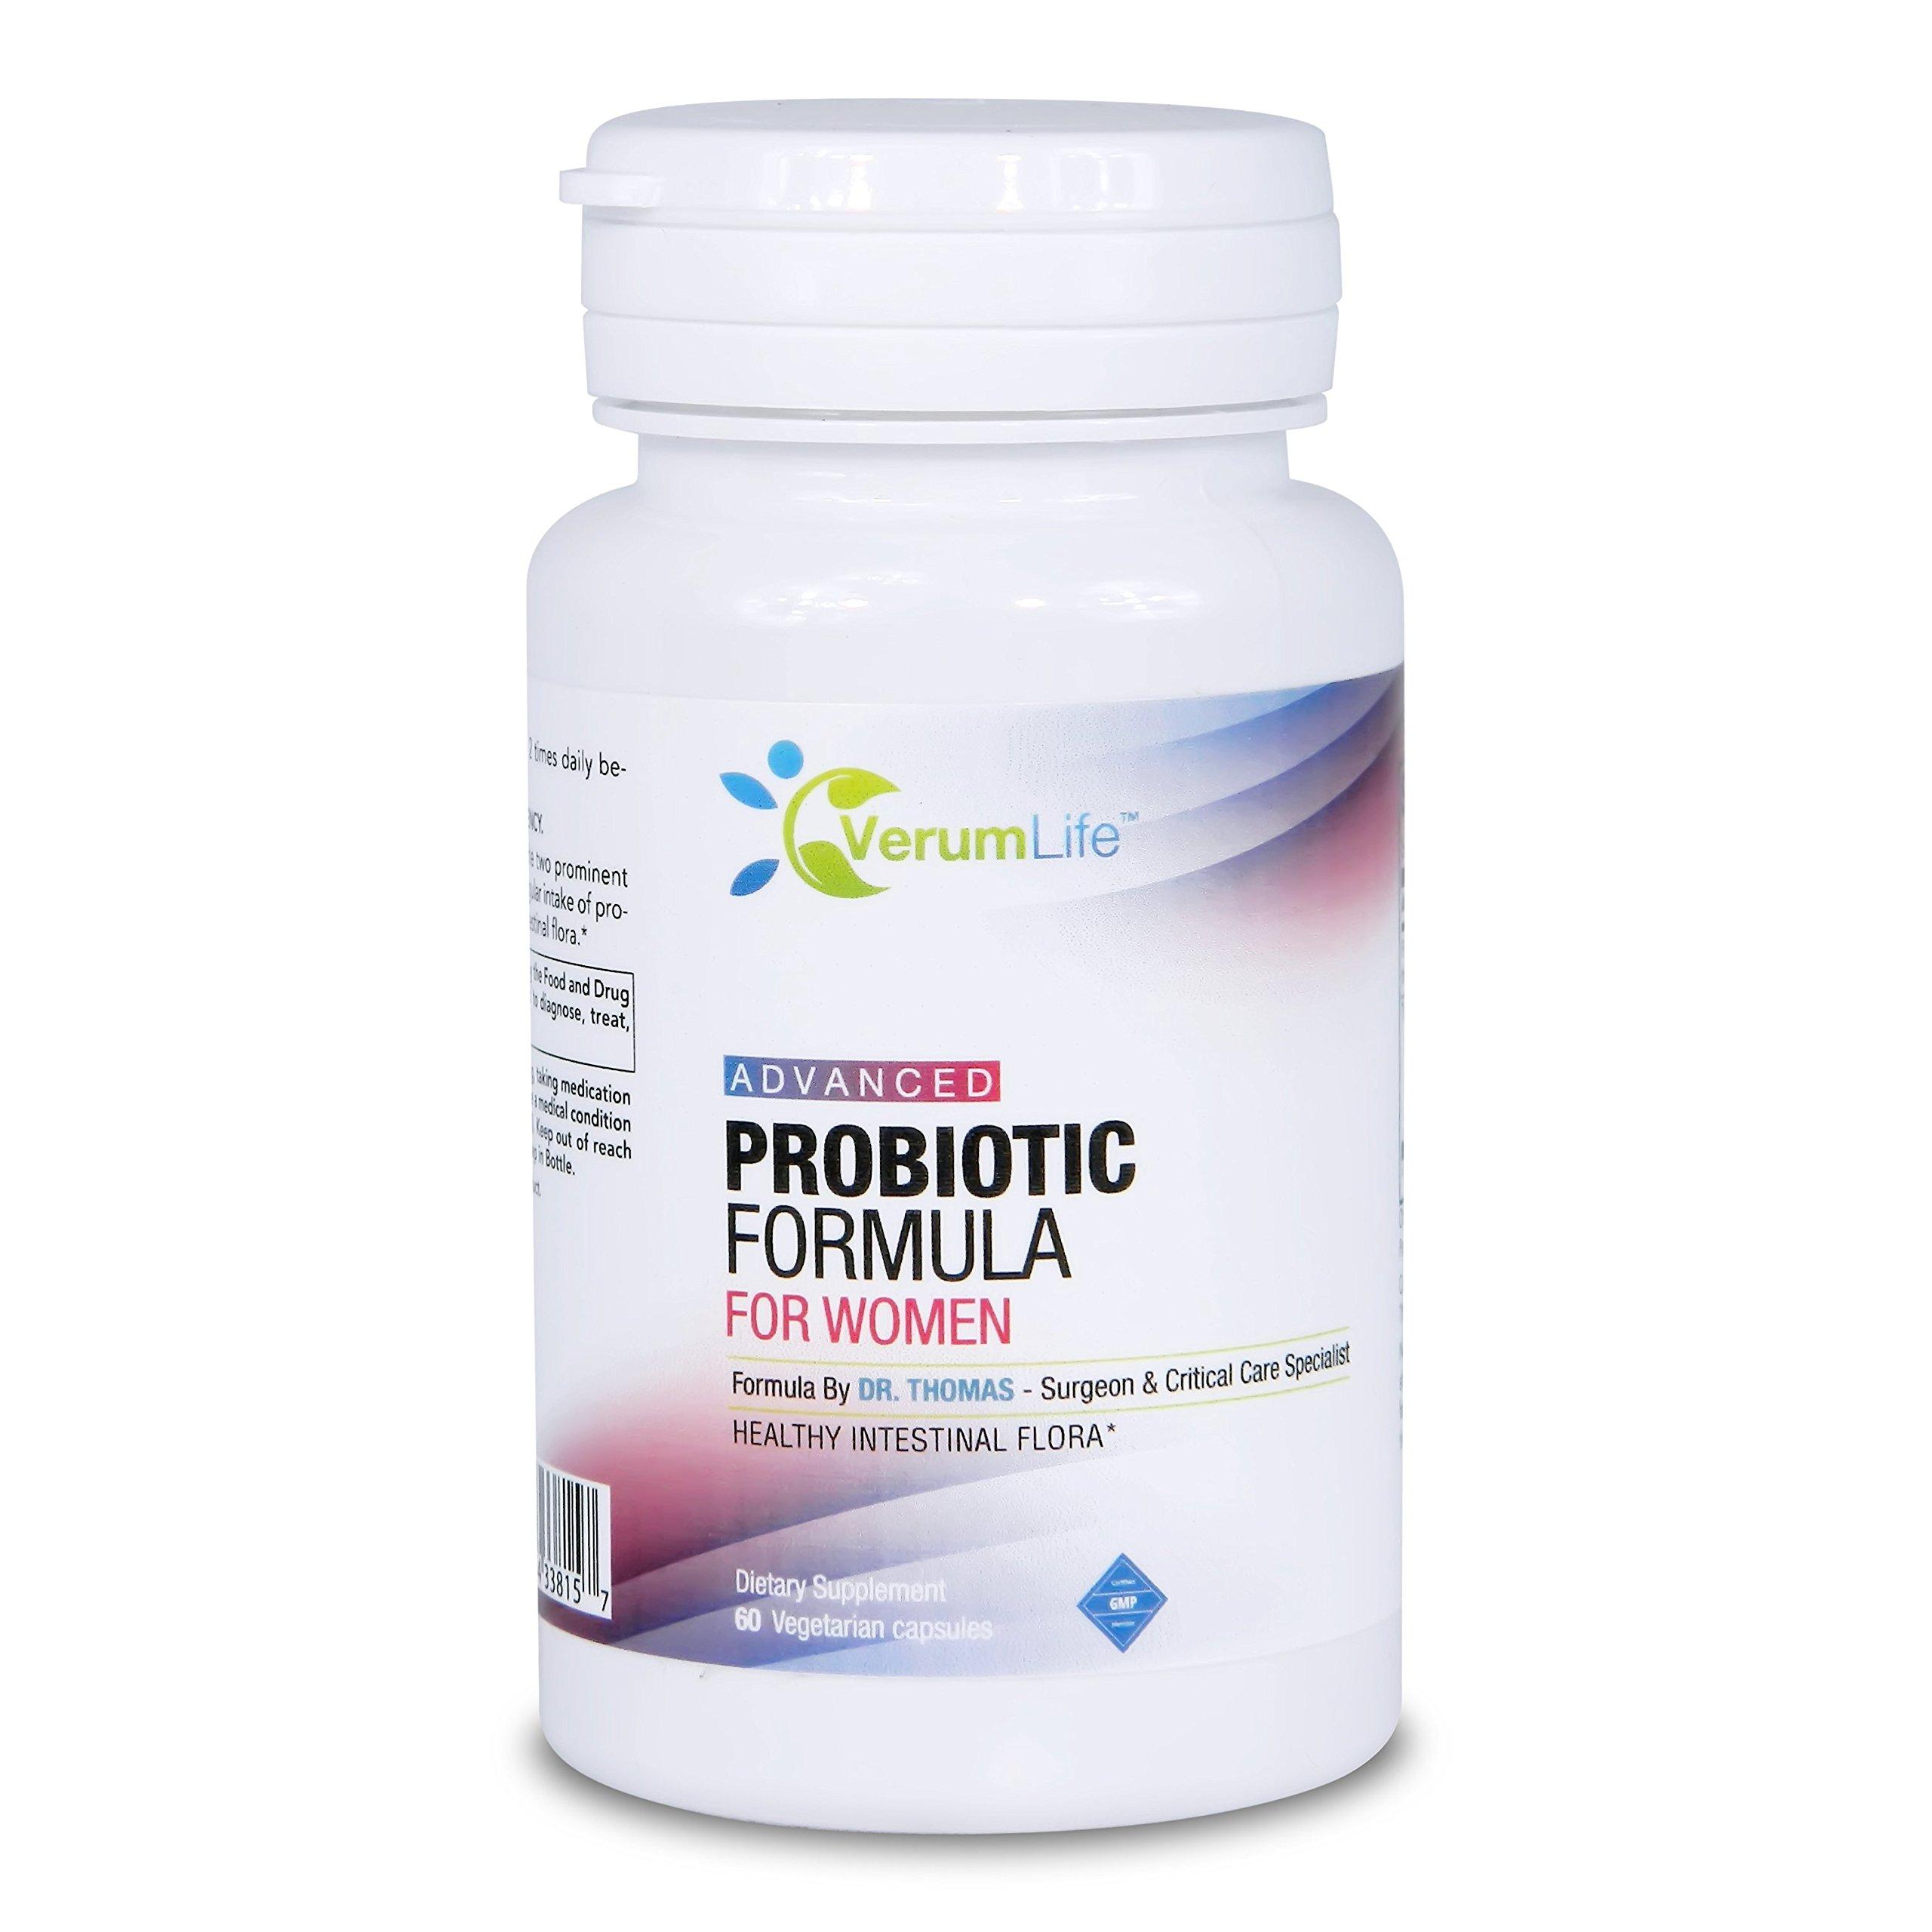 Probiotic For Women - Acidophilus & Bifidus Probiotic Blend For Proper Digestion And A Health Immune System (1 Bottle)